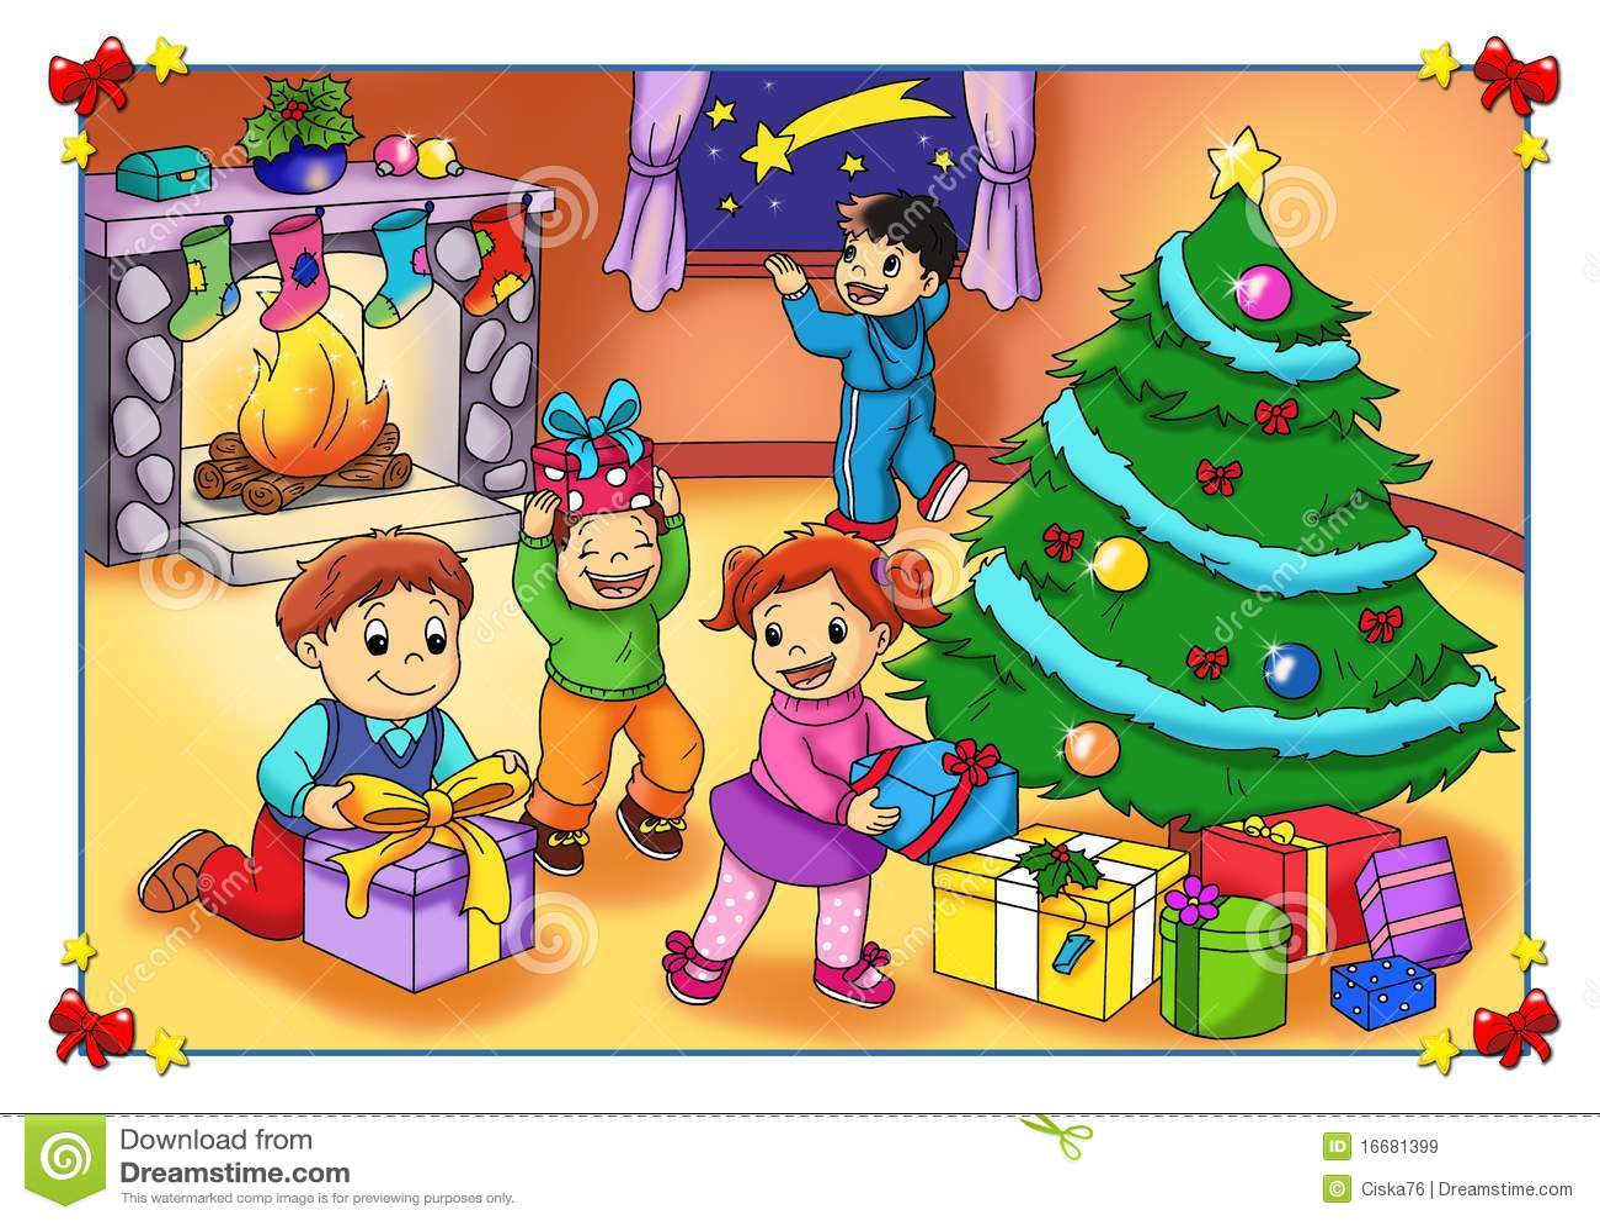 Imagen De Una Familia Feliz Animada: Die Freude Am Weihnachten Stock Abbildung. Illustration